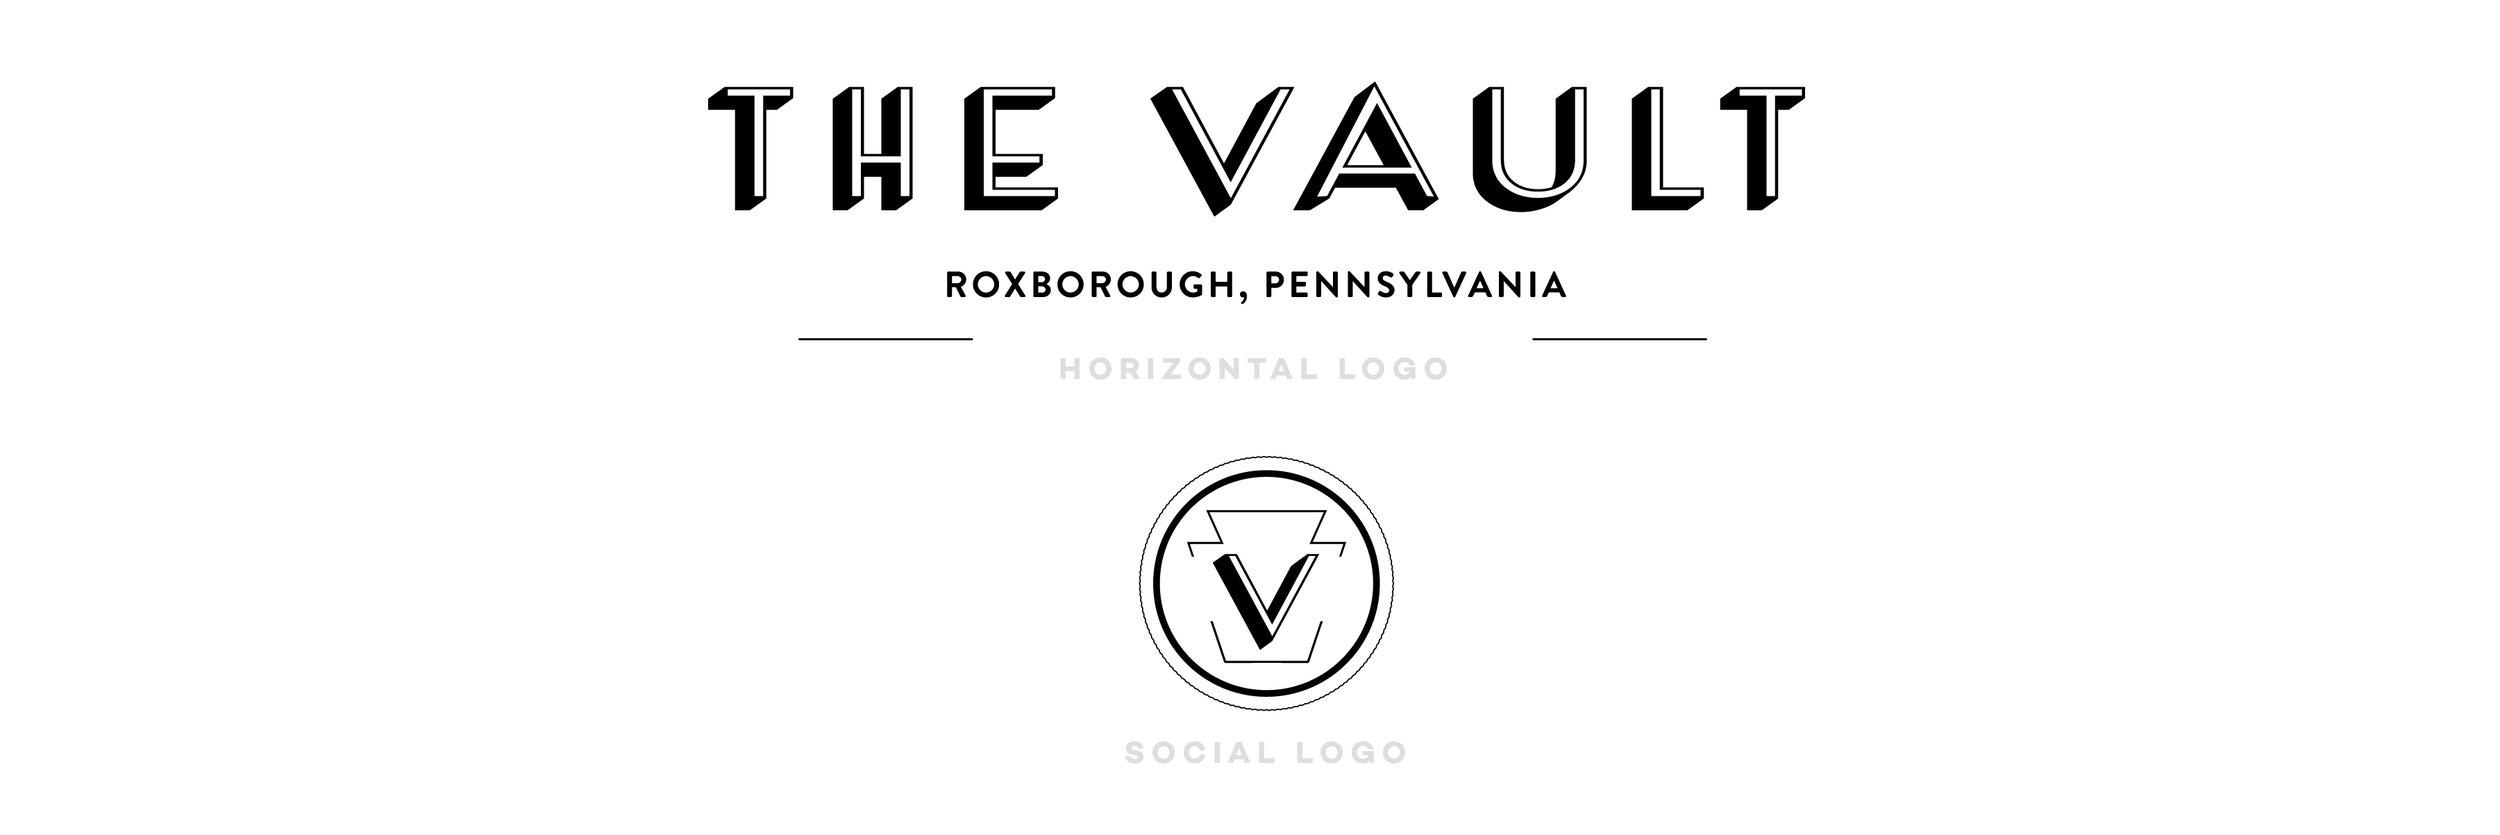 TheVaultLogo_052319_Client-20.jpg